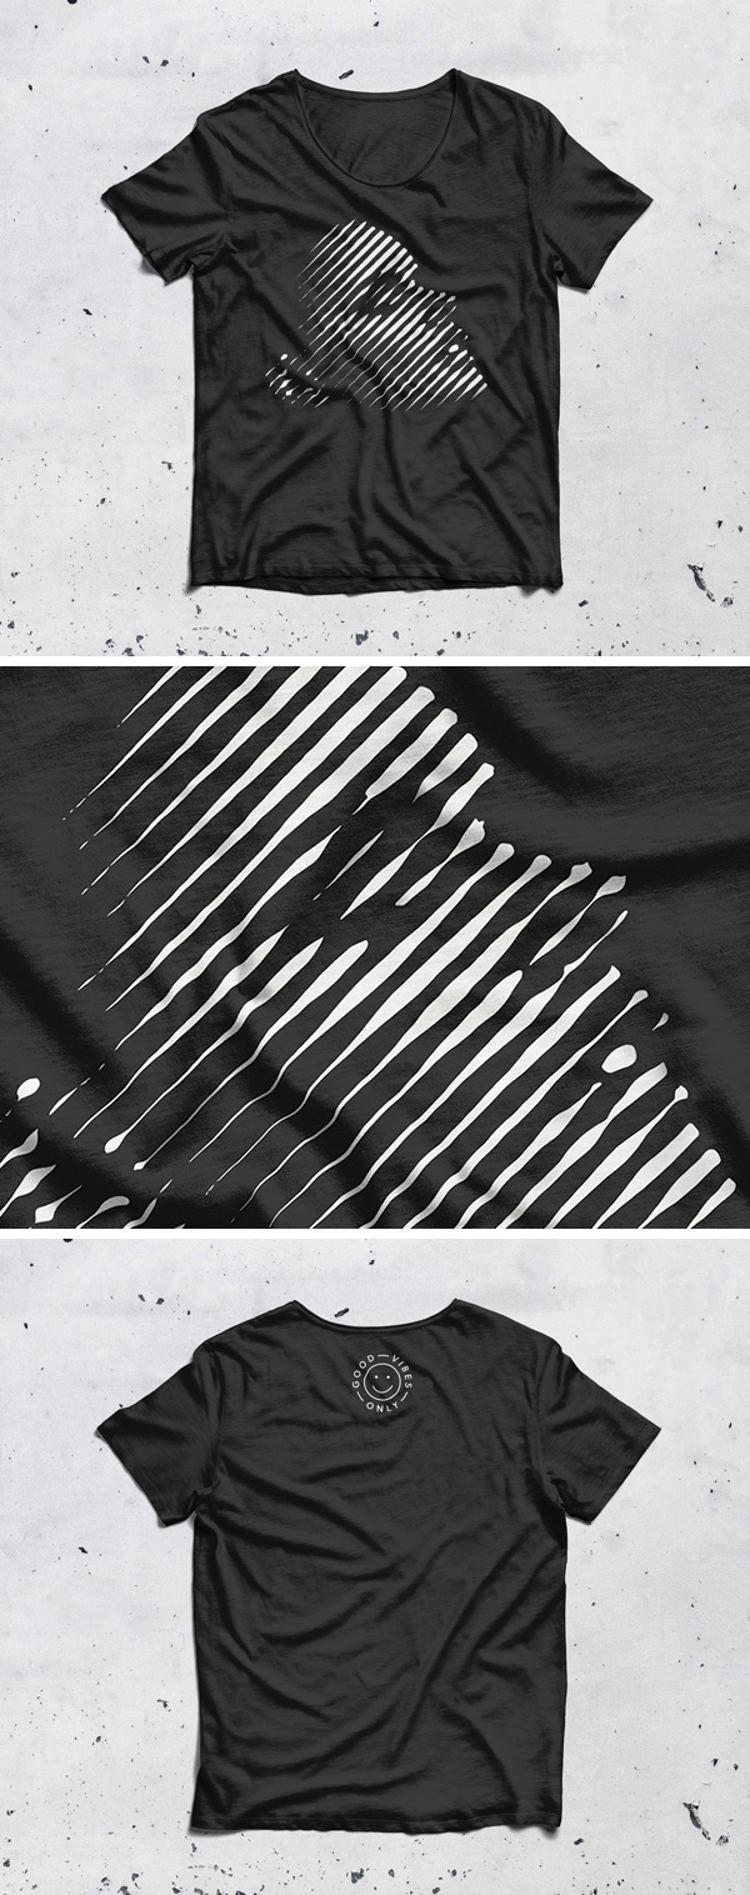 Free T Shirt Mockup Psd By Graphicburger Shirt Mockup Clothing Mockup Tshirt Mockup